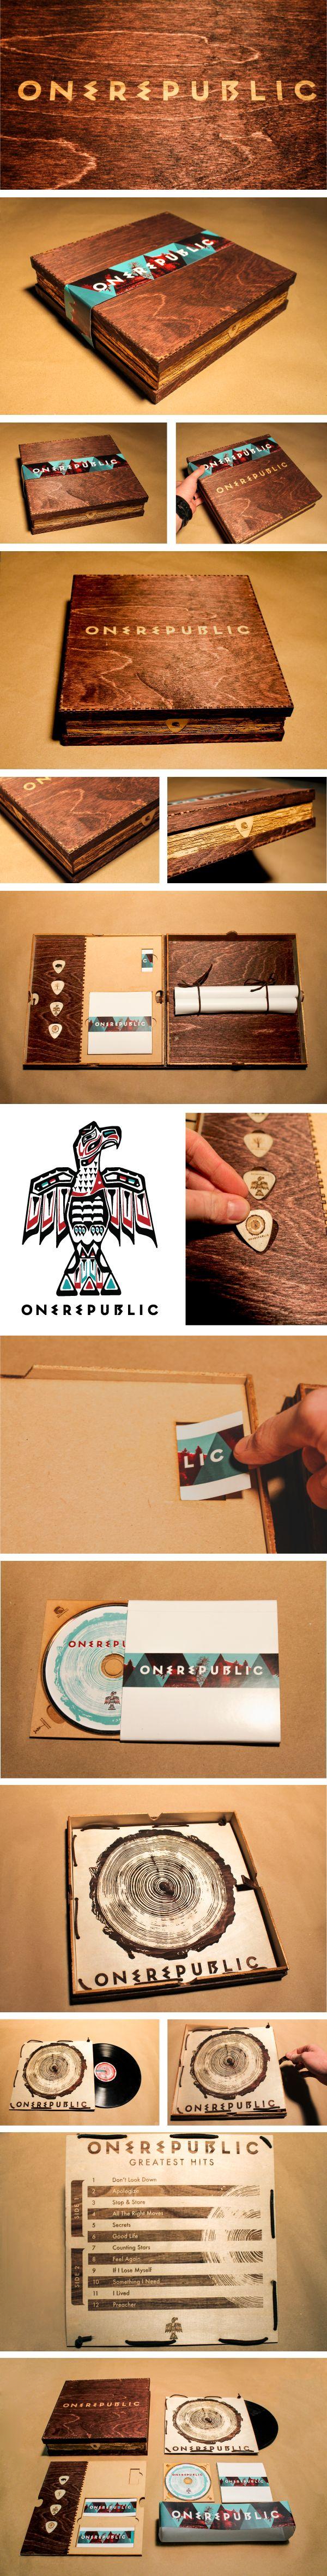 *O* OneRepublic Special Edition Album by Jordan Anderson, via Behance OMG I want it!!!